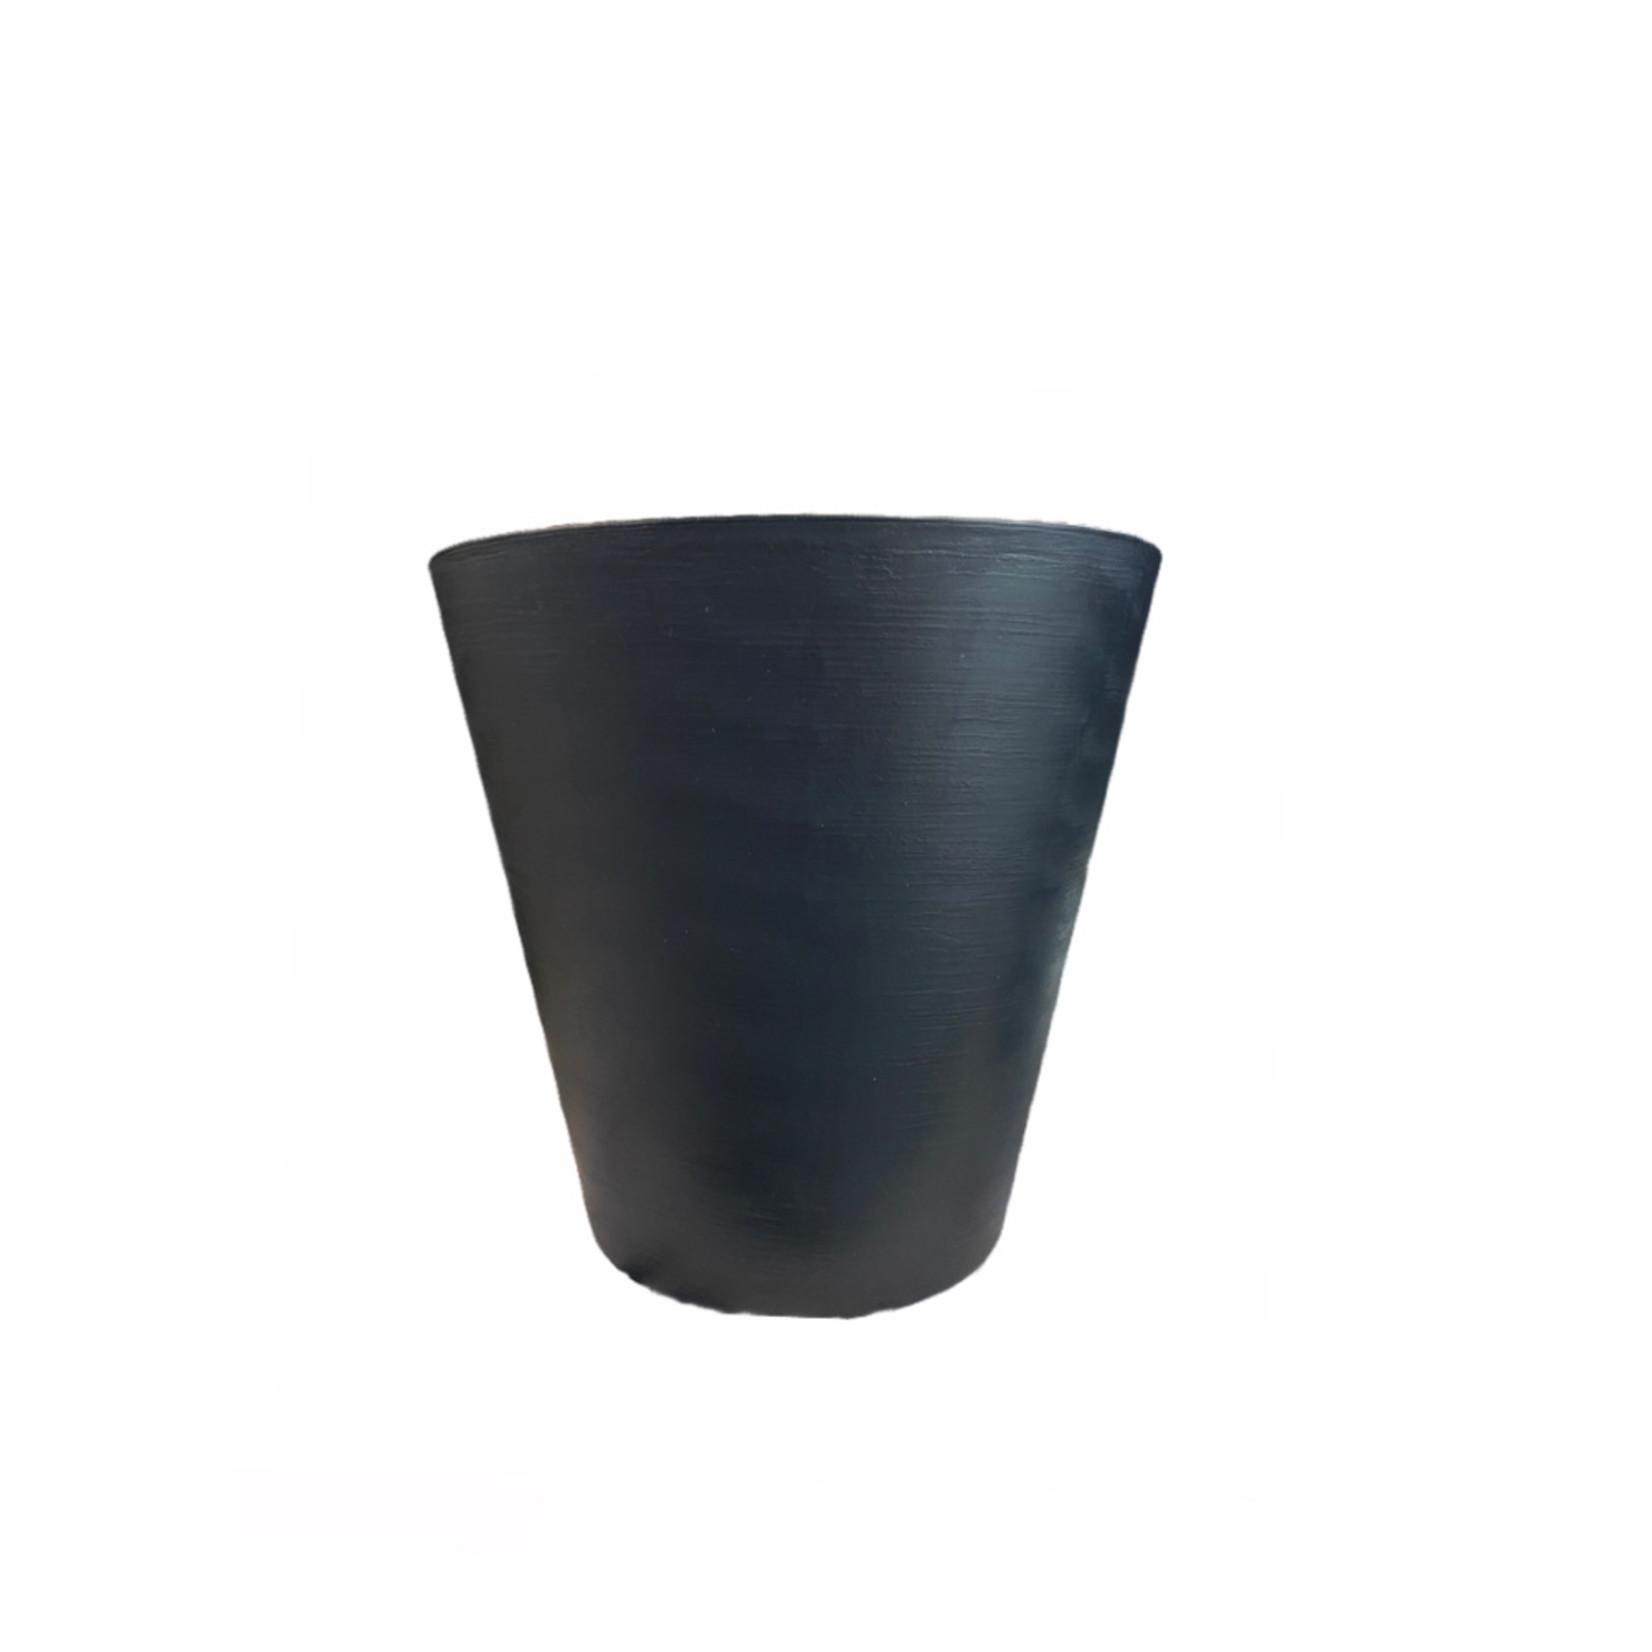 Teraplast Repot Hoop Black 25cm